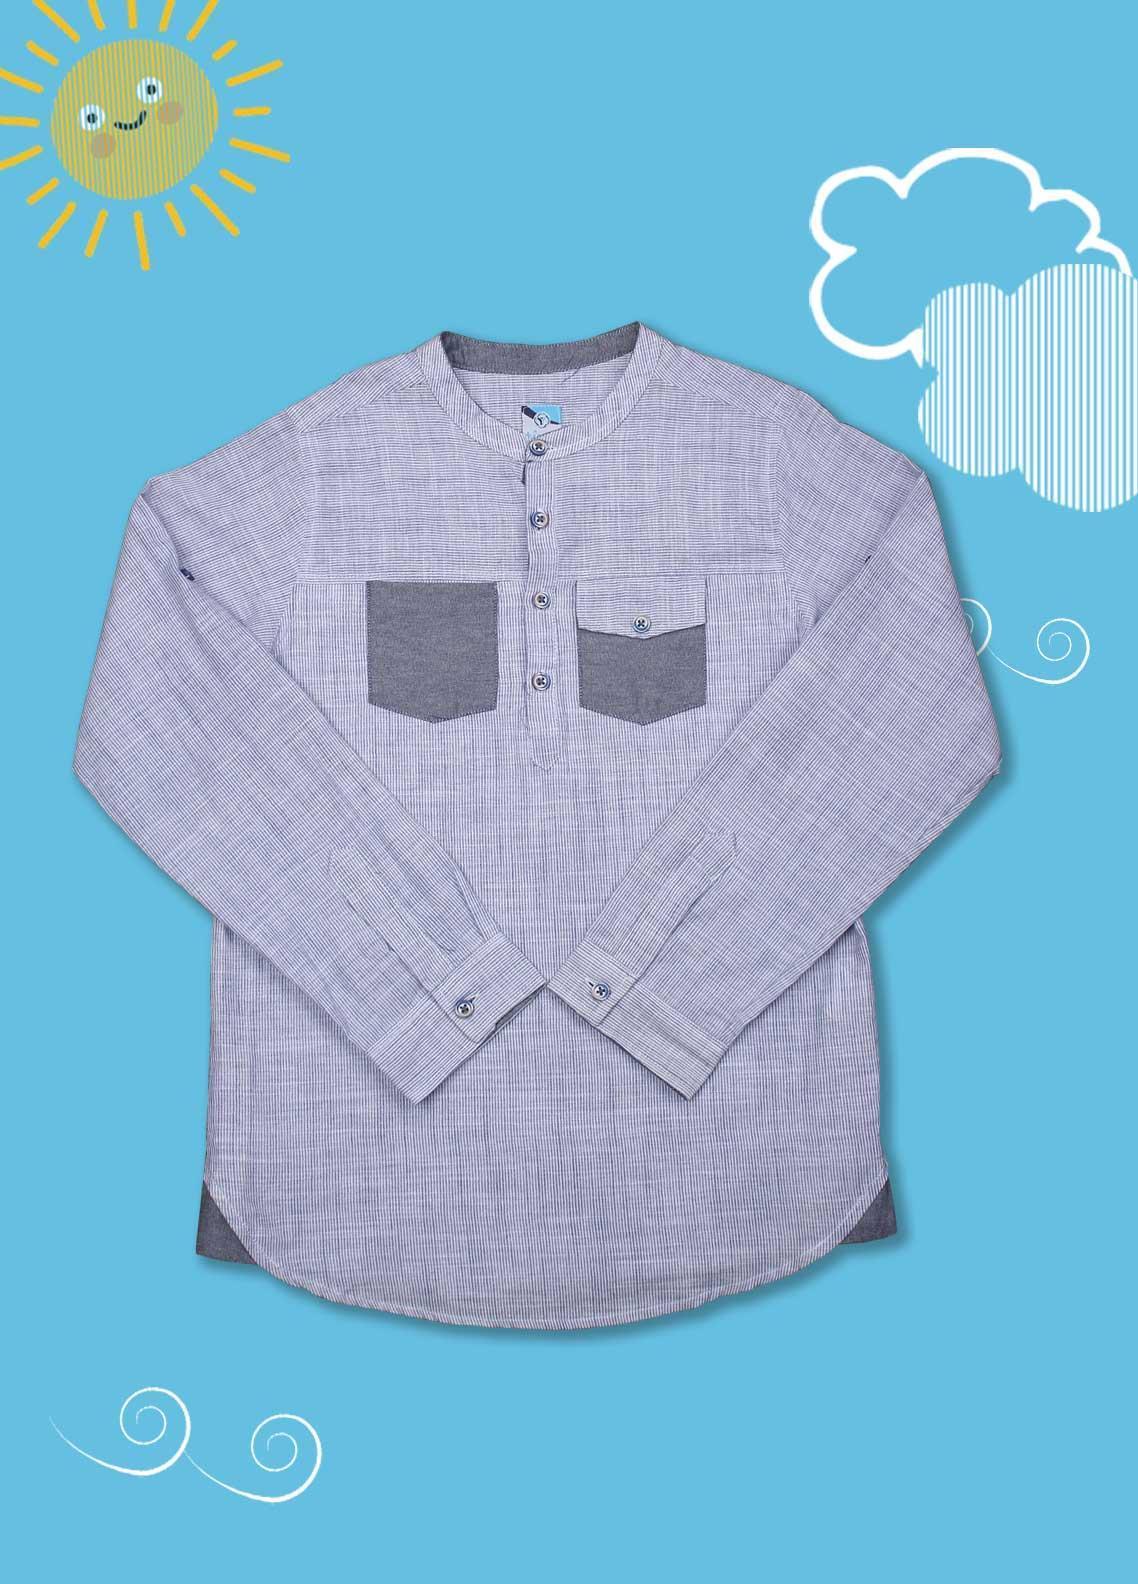 Sanaulla Exclusive Range Cotton Casual Shirts for Boys -  D-1014 Light Blue